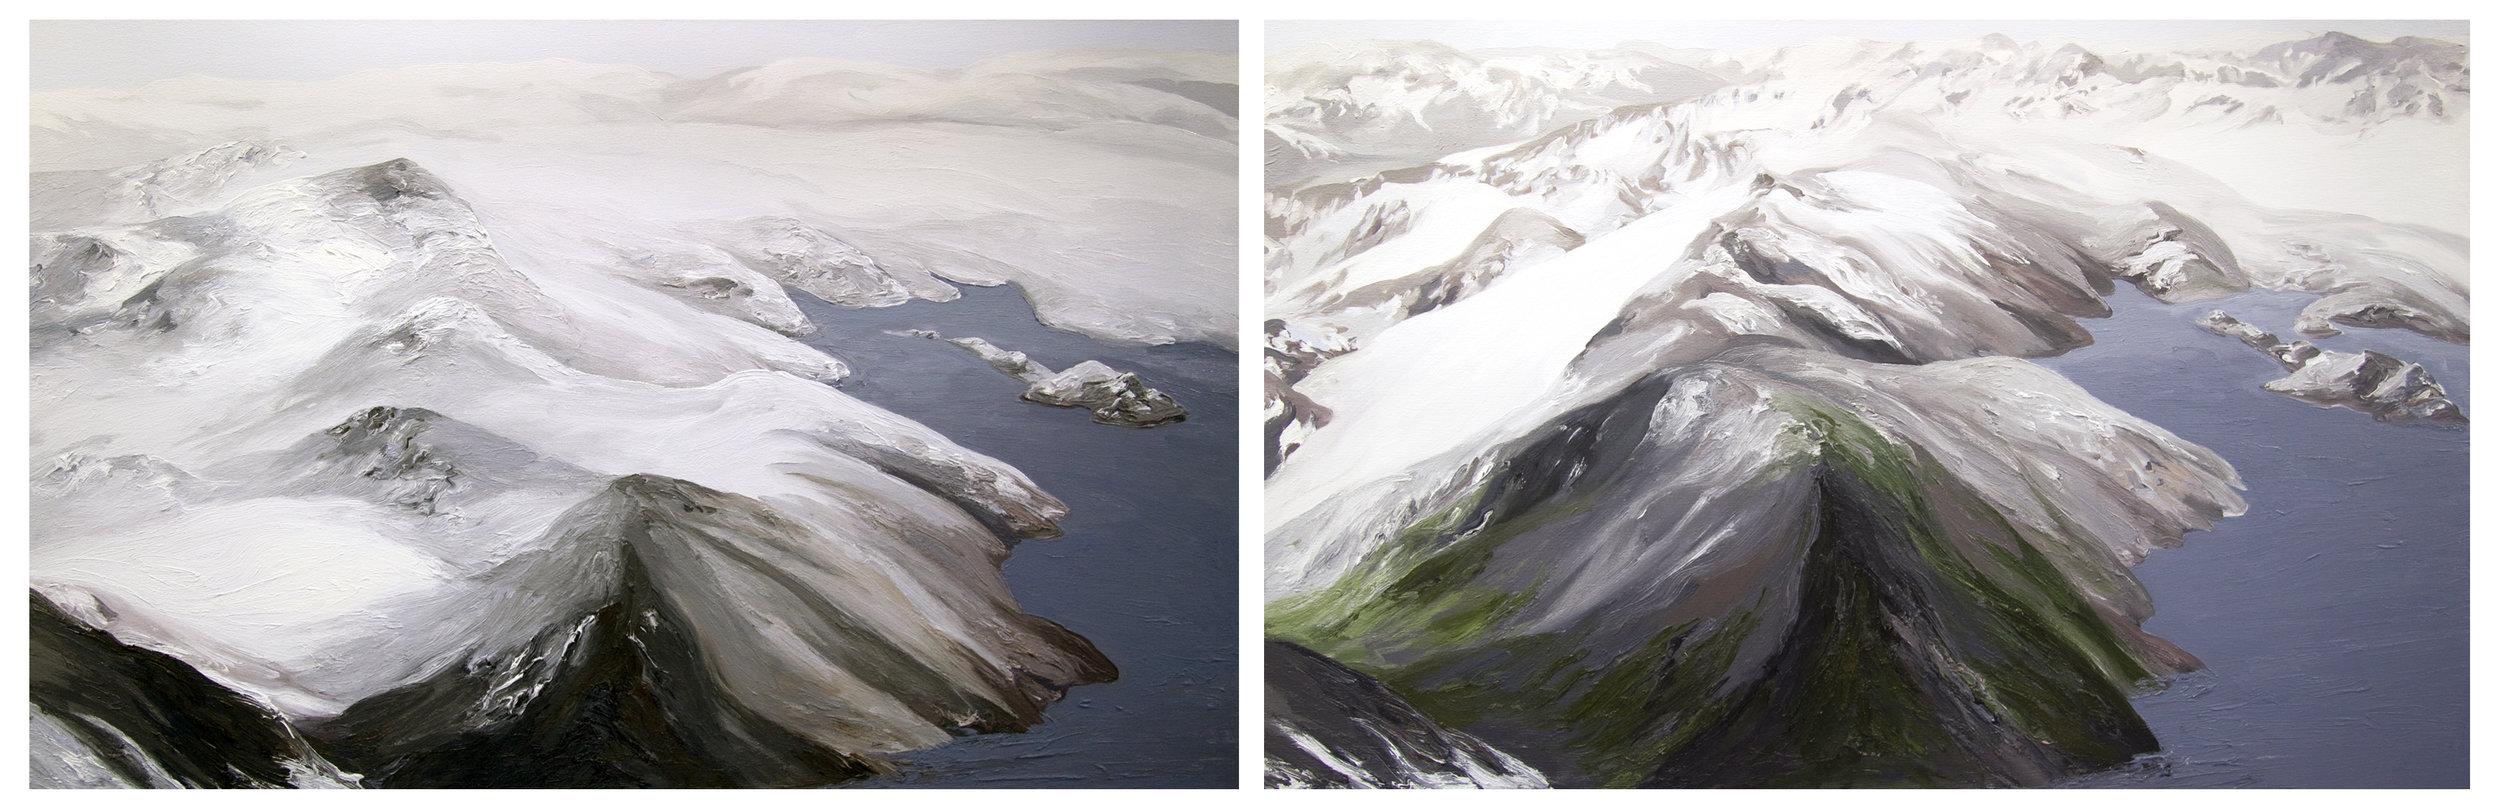 Tebenkof Glacier 1, 2